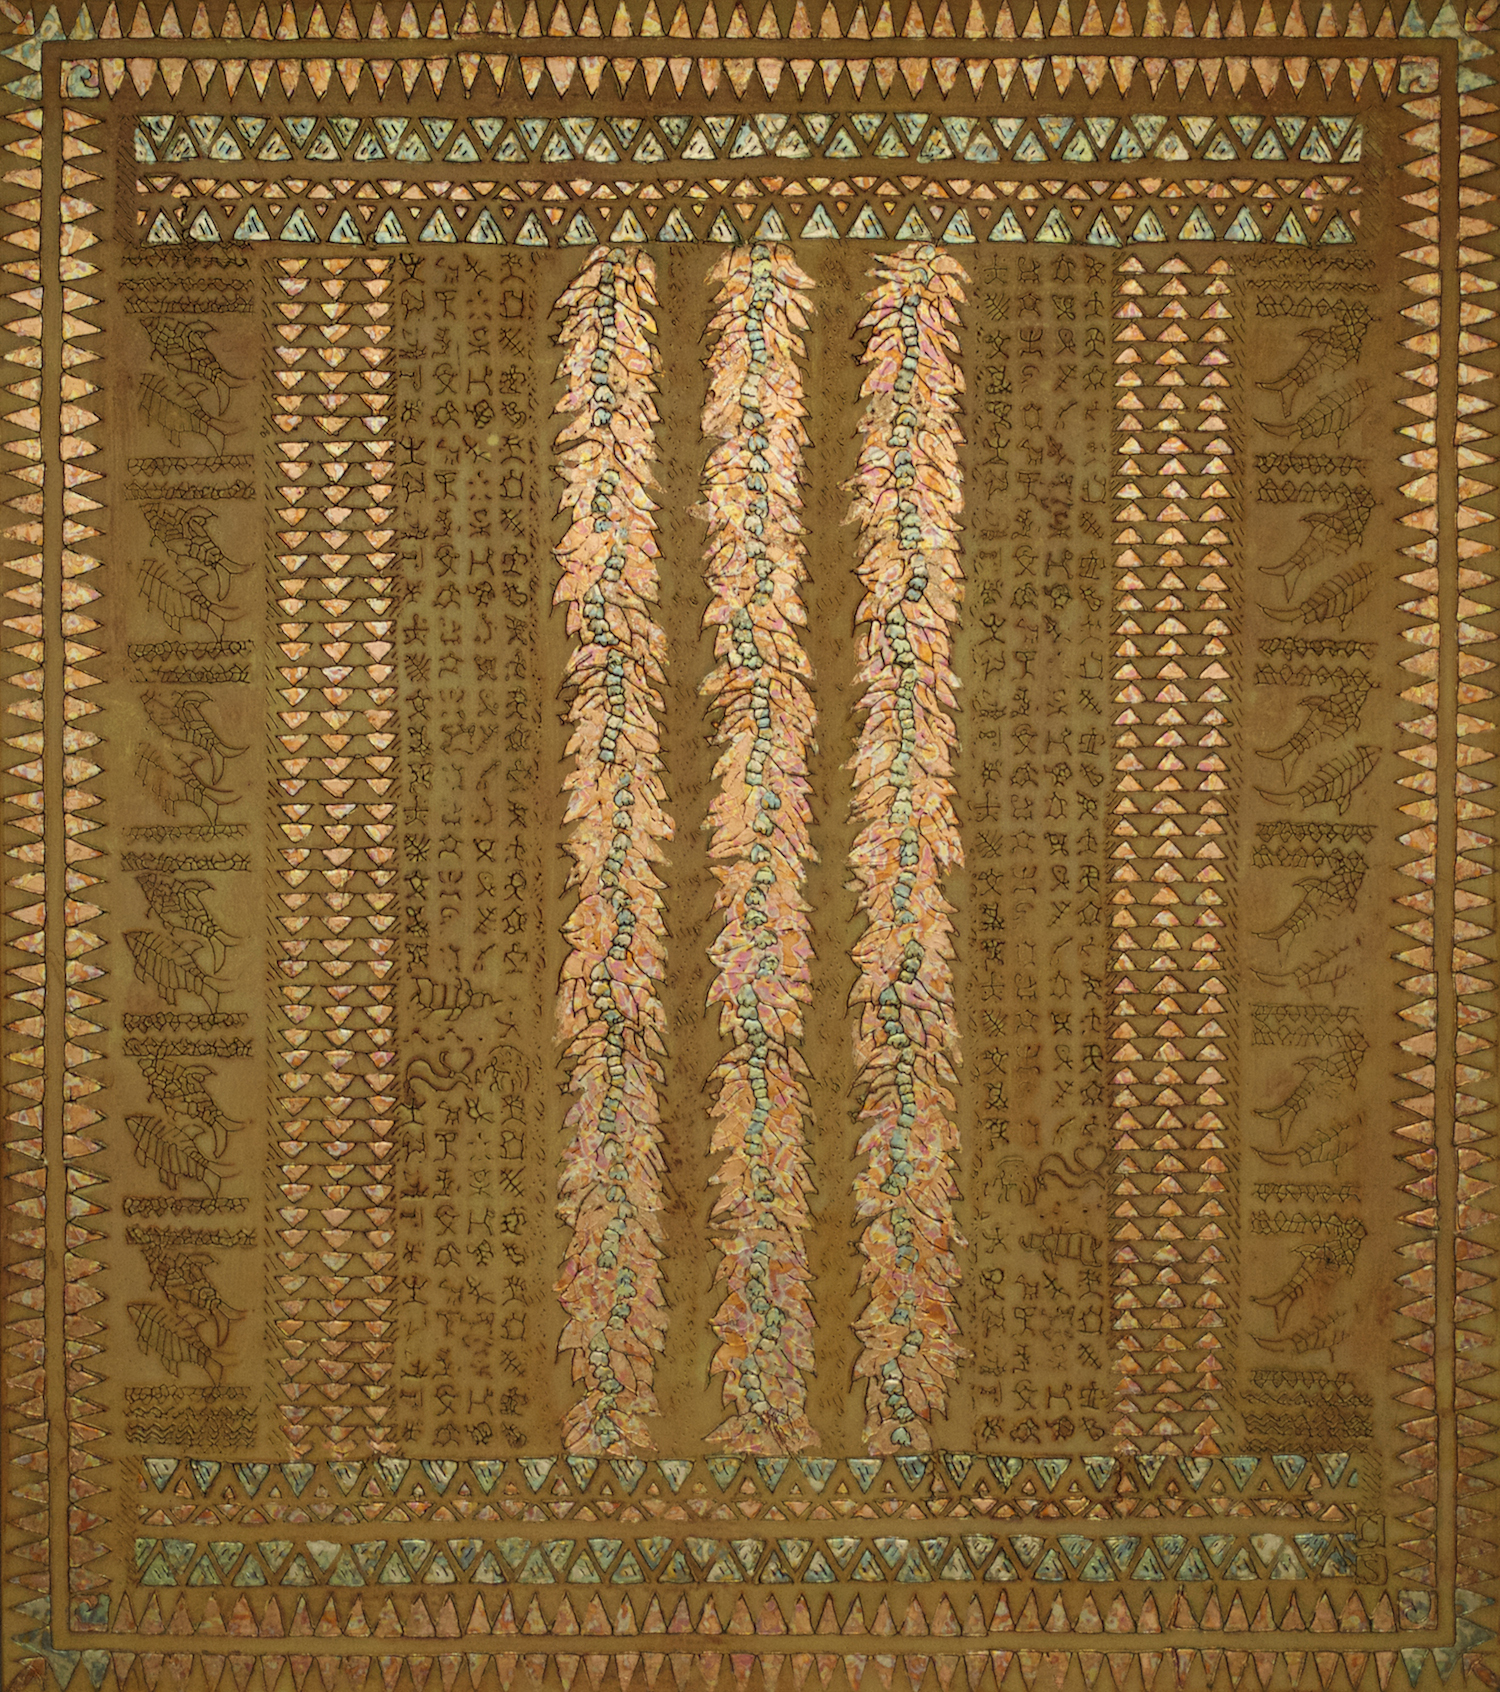 Pua Pule (Hawaiian- Flower Prayer)